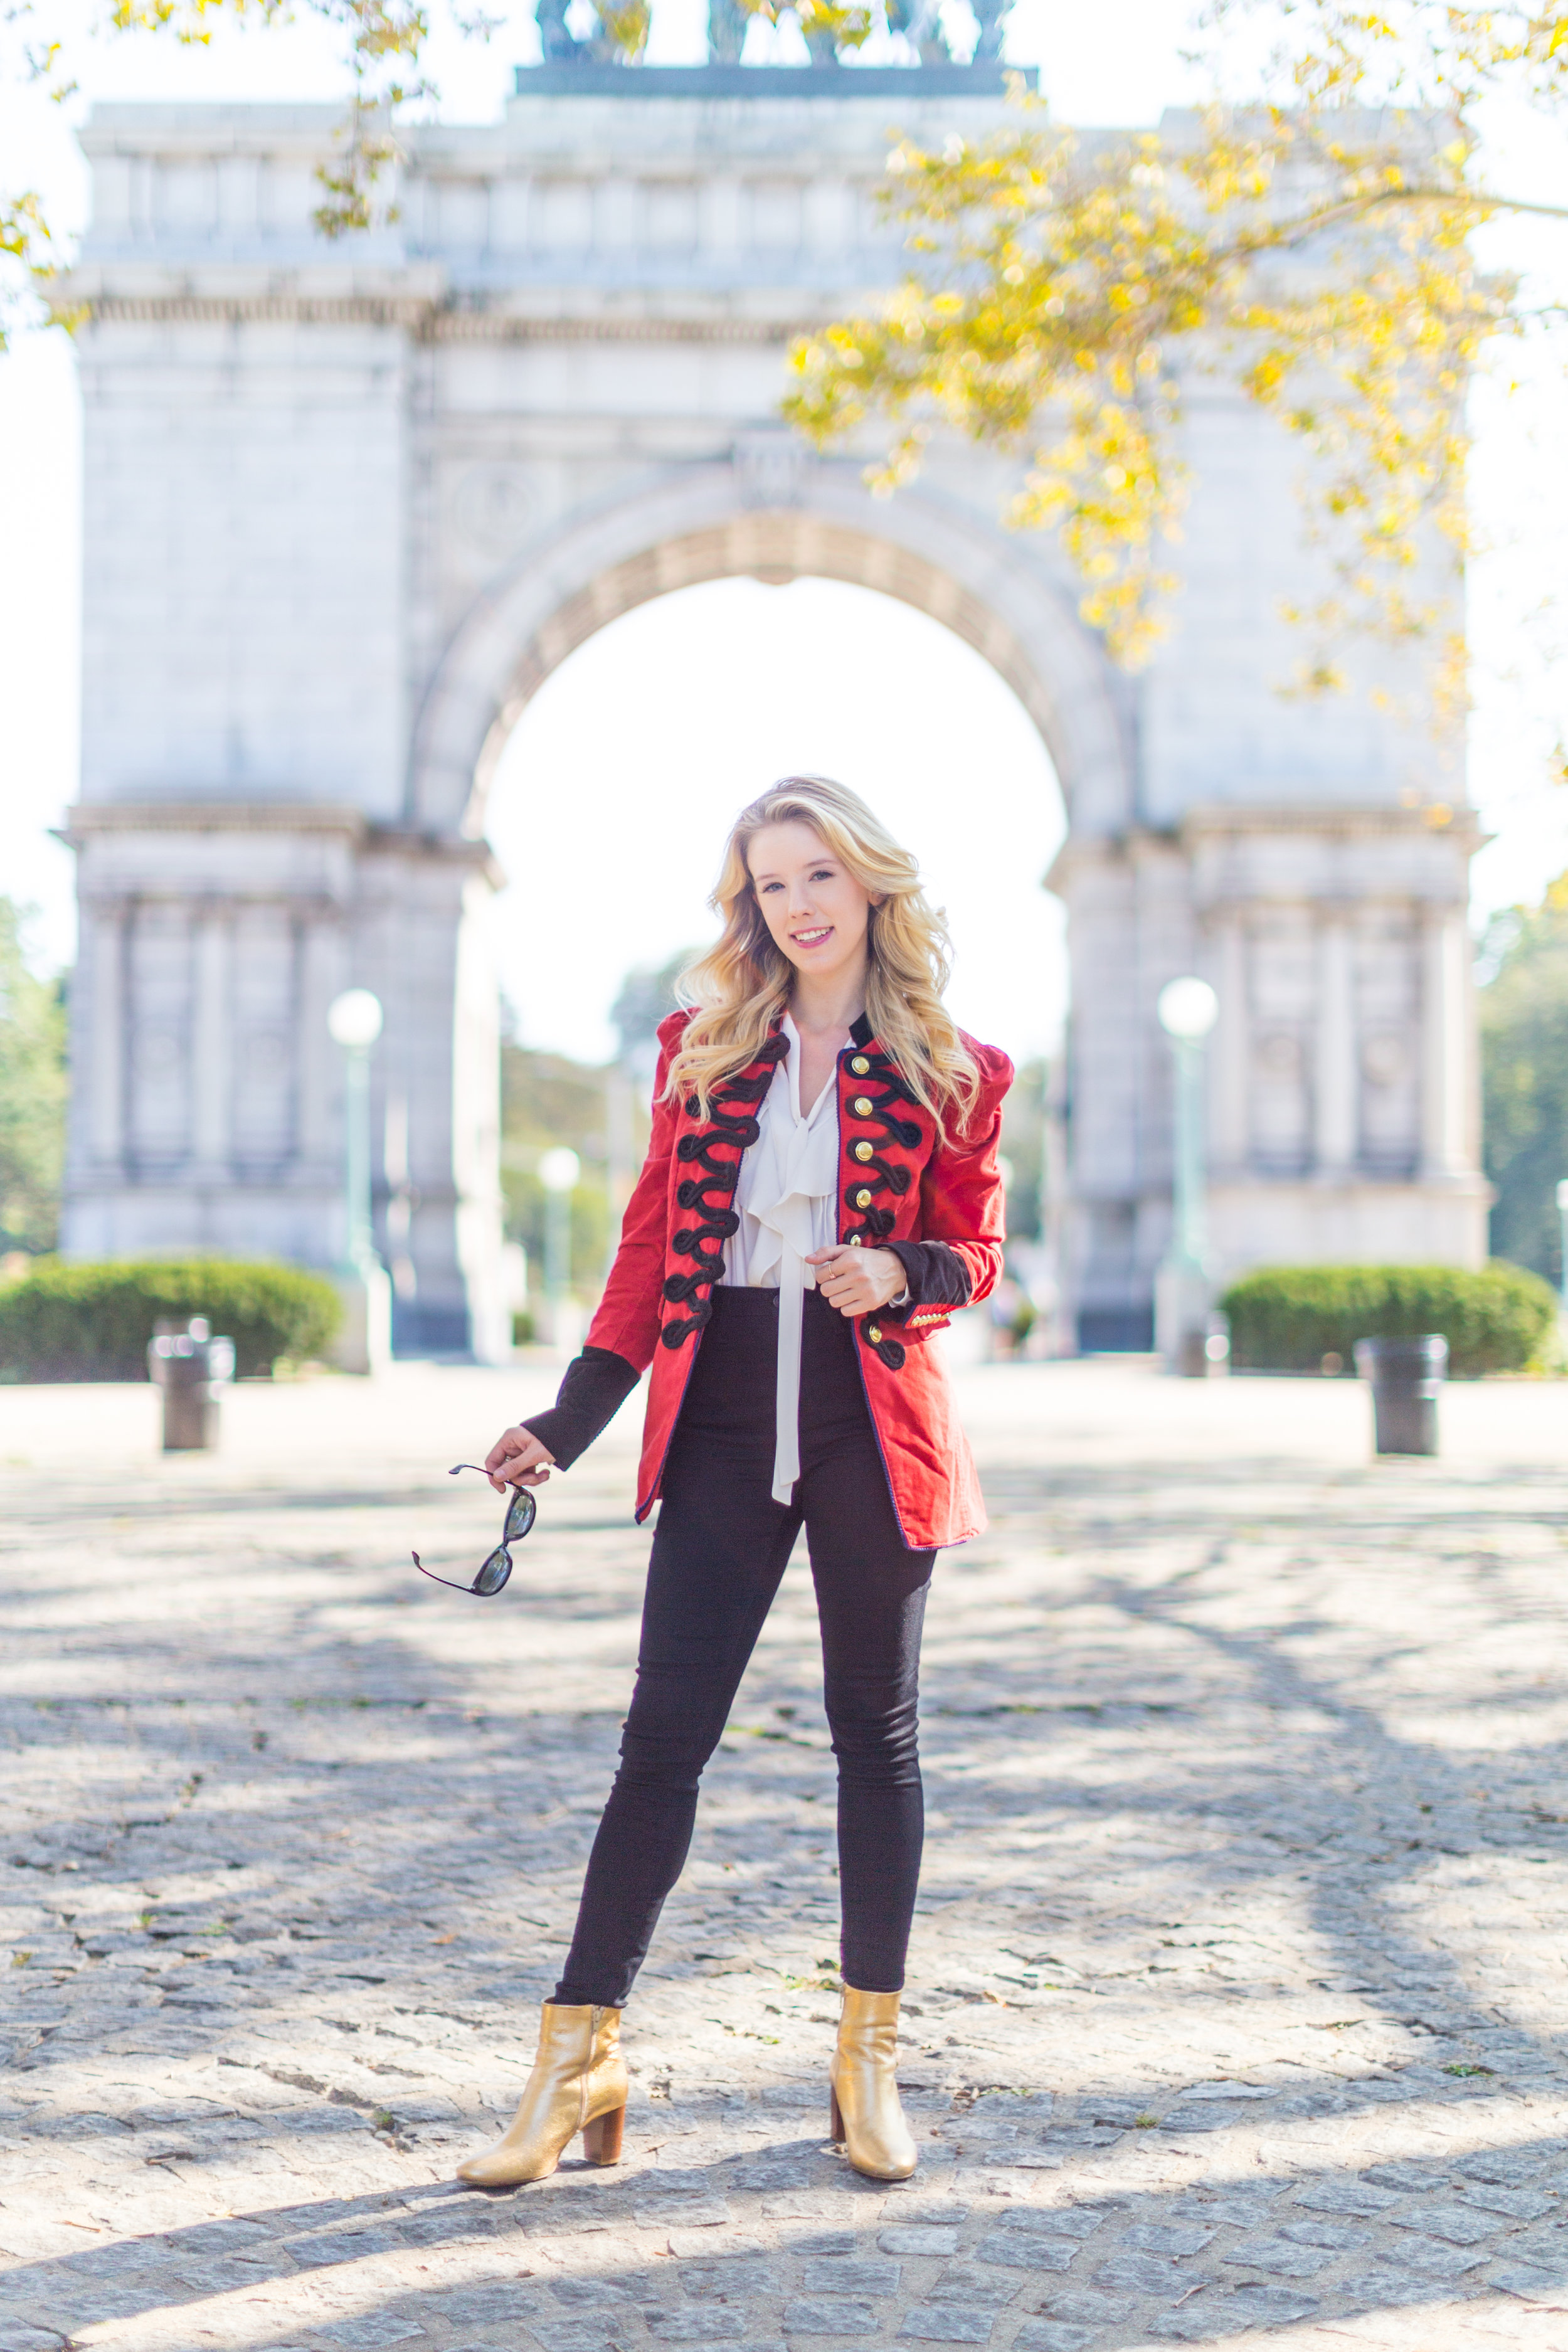 Fall Fashion Red Band Jacket Trendy-4.jpg